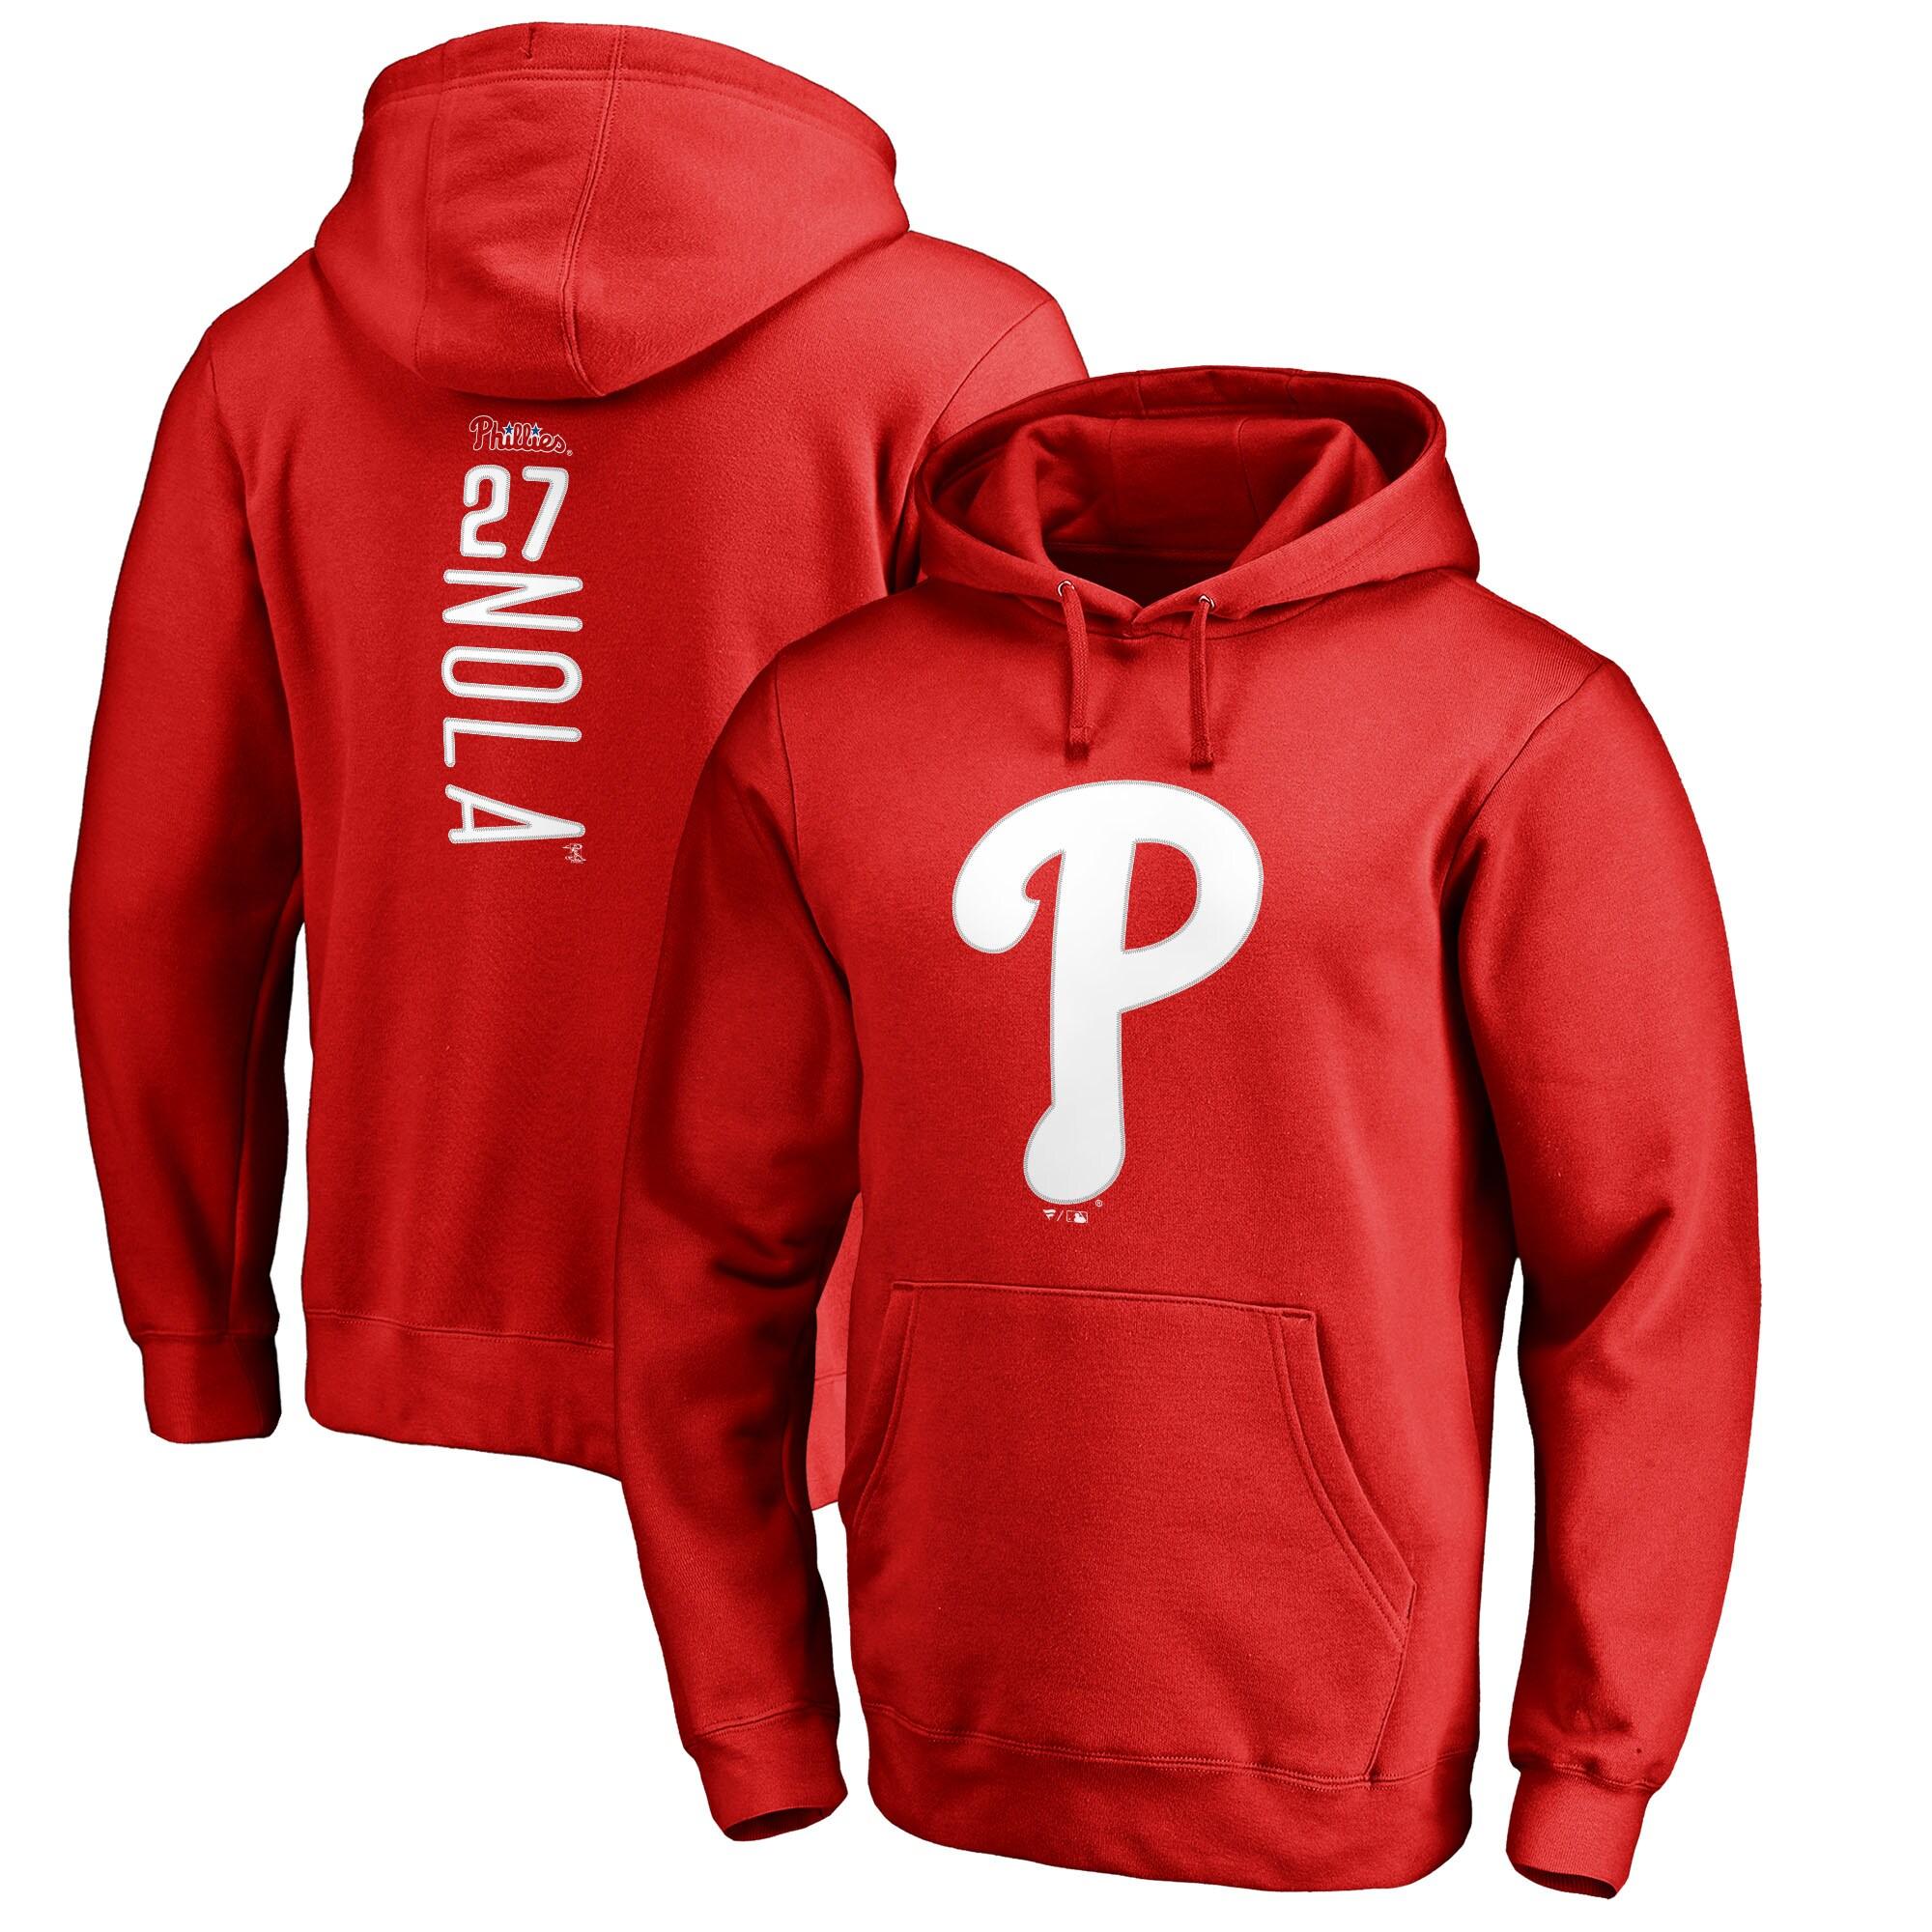 Aaron Nola Philadelphia Phillies Fanatics Branded Backer Pullover Hoodie - Red